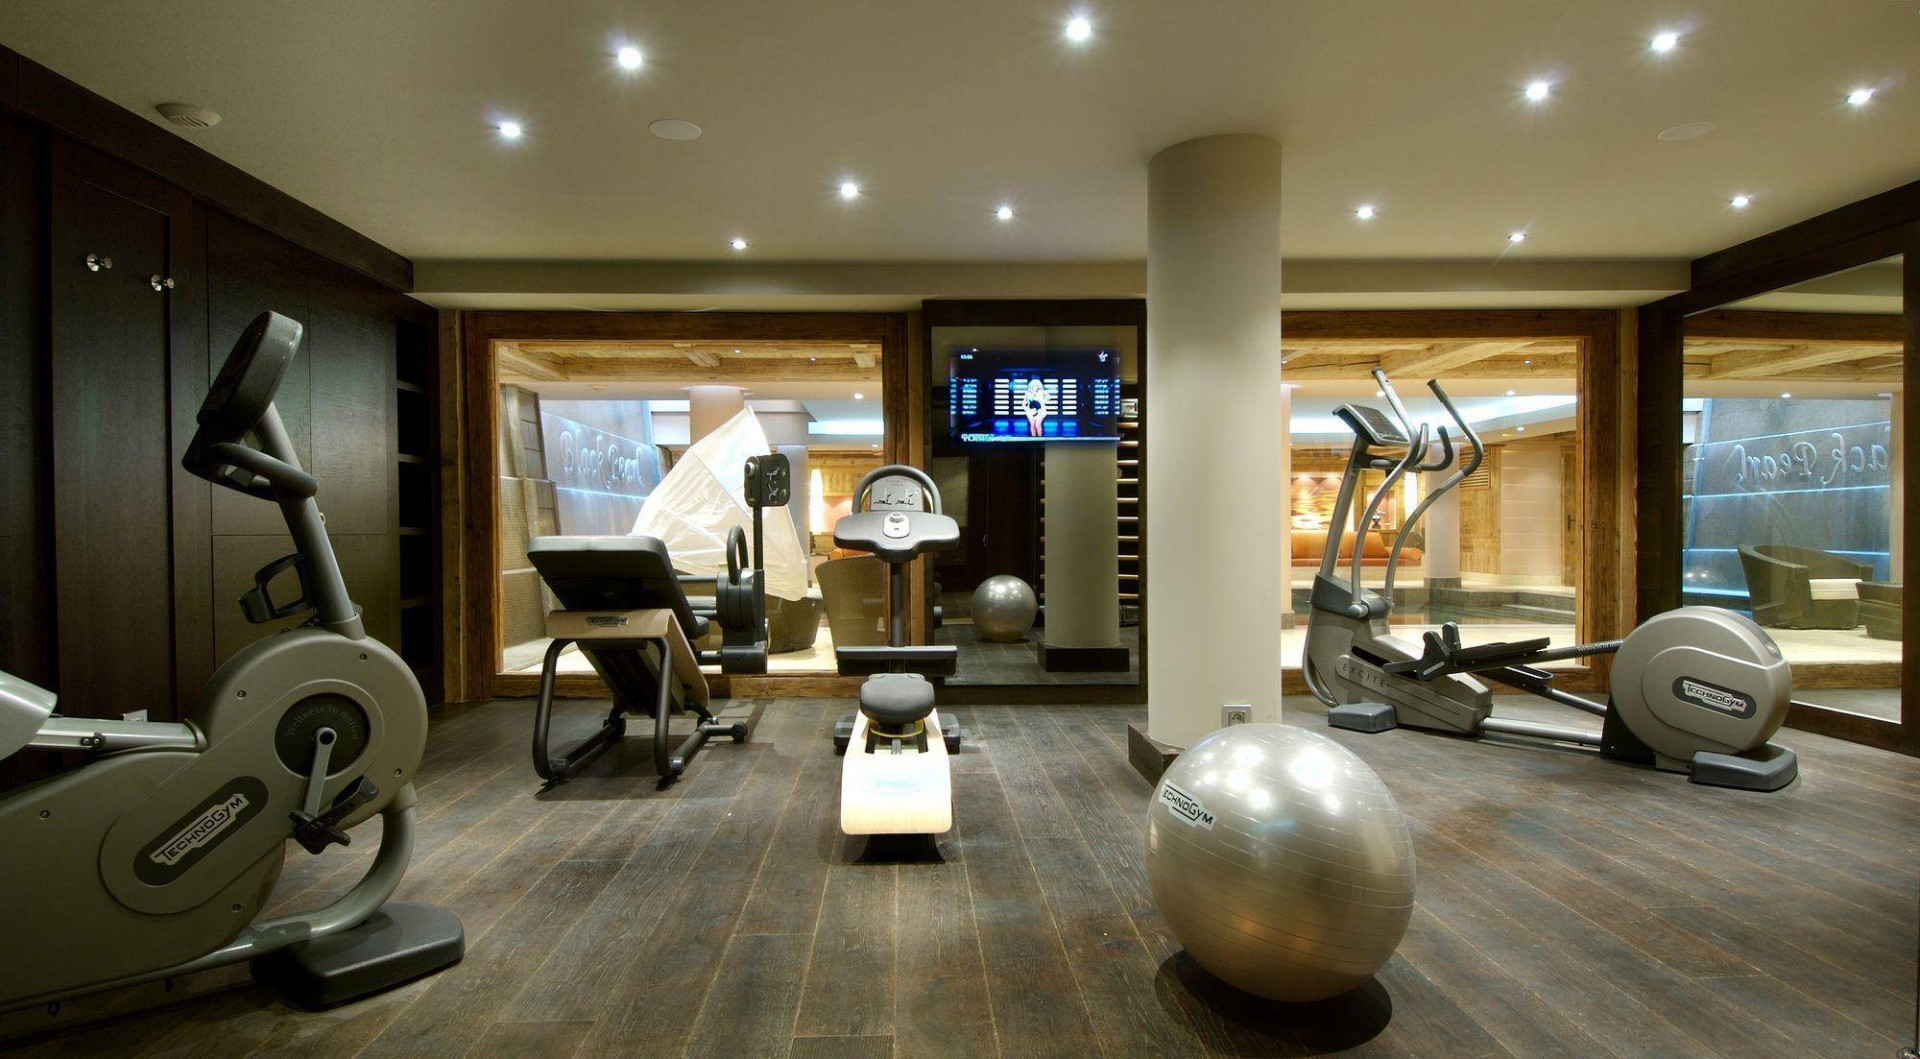 Courchevel 1850 Luxury Rental Chalet Bepalite Fitness Room